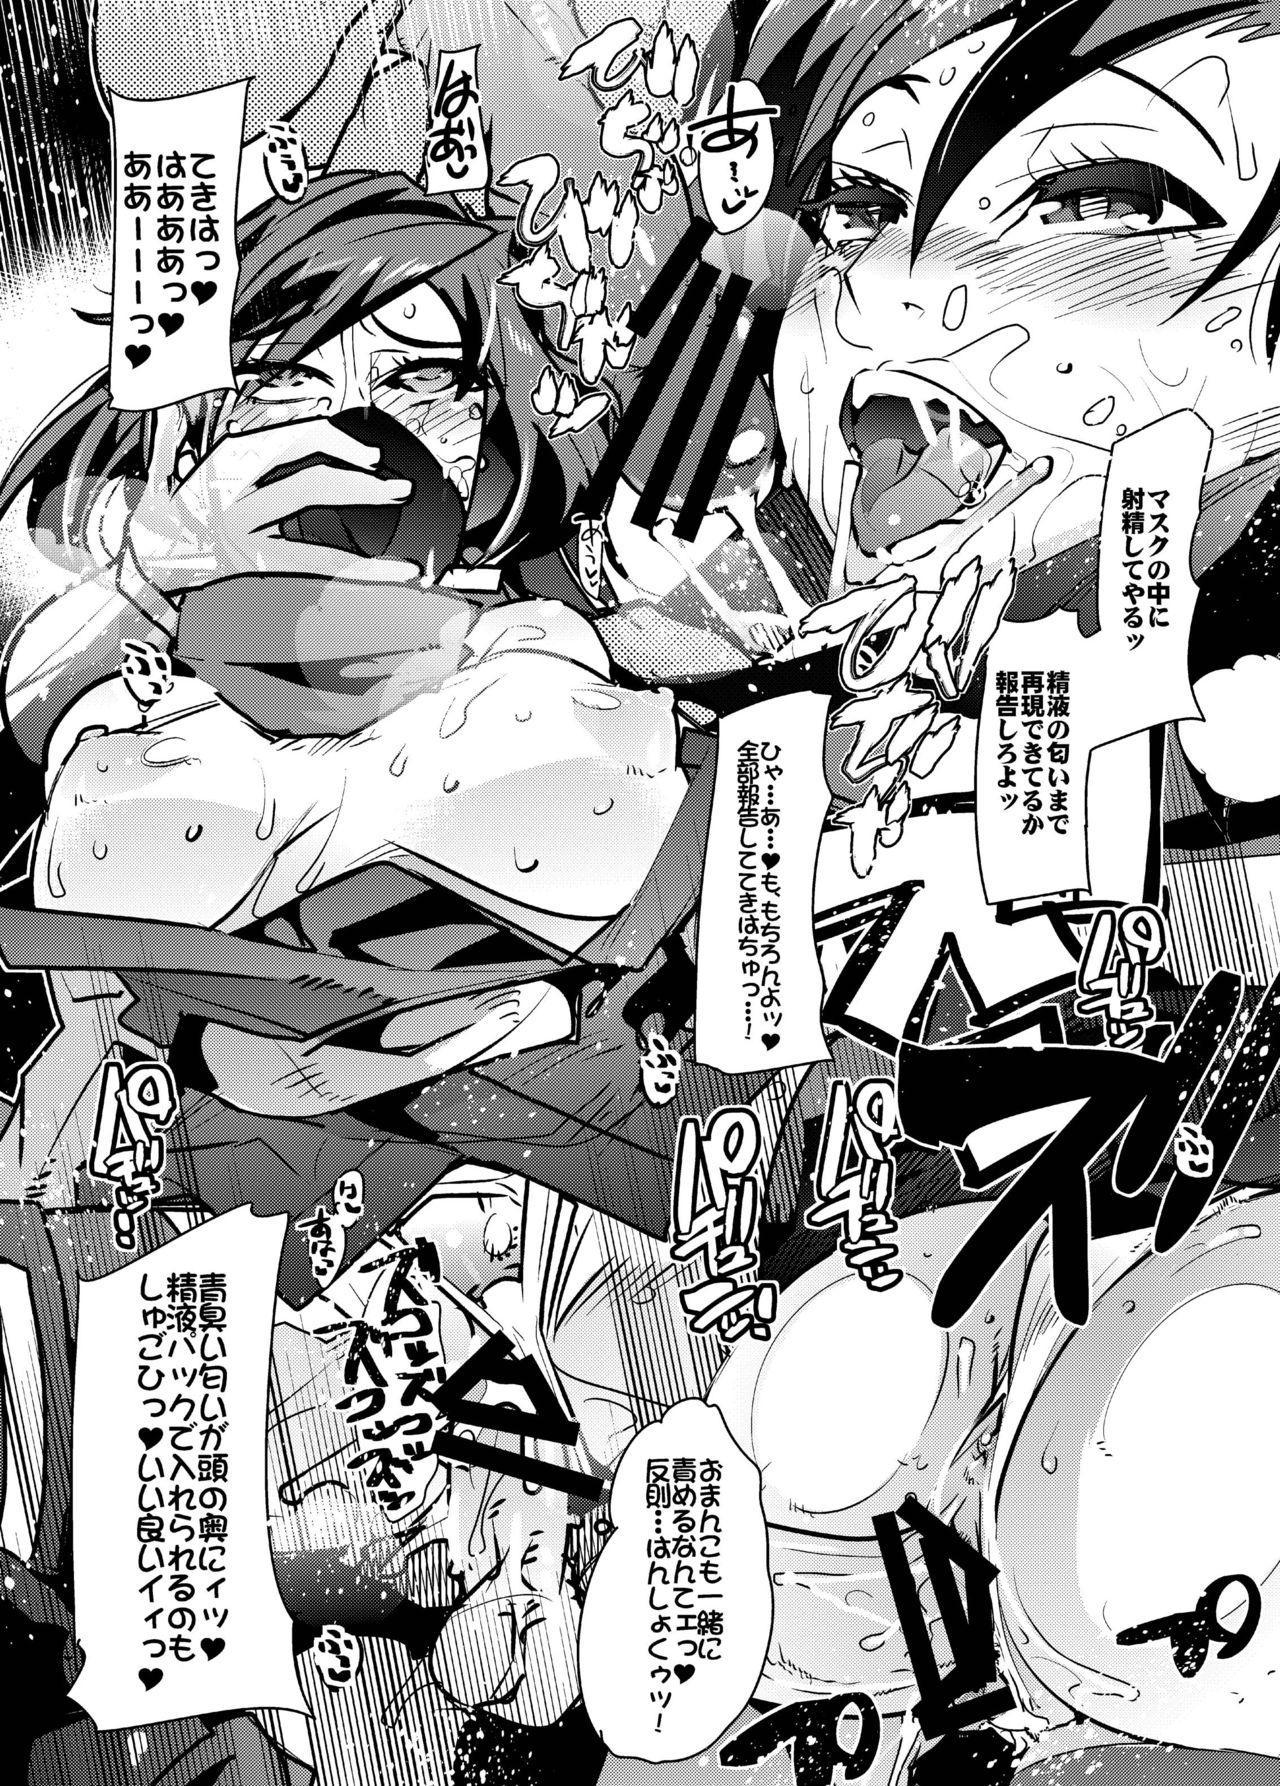 [Bronco Hitoritabi (Uchi-Uchi Keyaki)] Diver-nin Ayame to Ecchi na Mokeiya no Onee-san (Gundam Build Divers) [Digital] 9